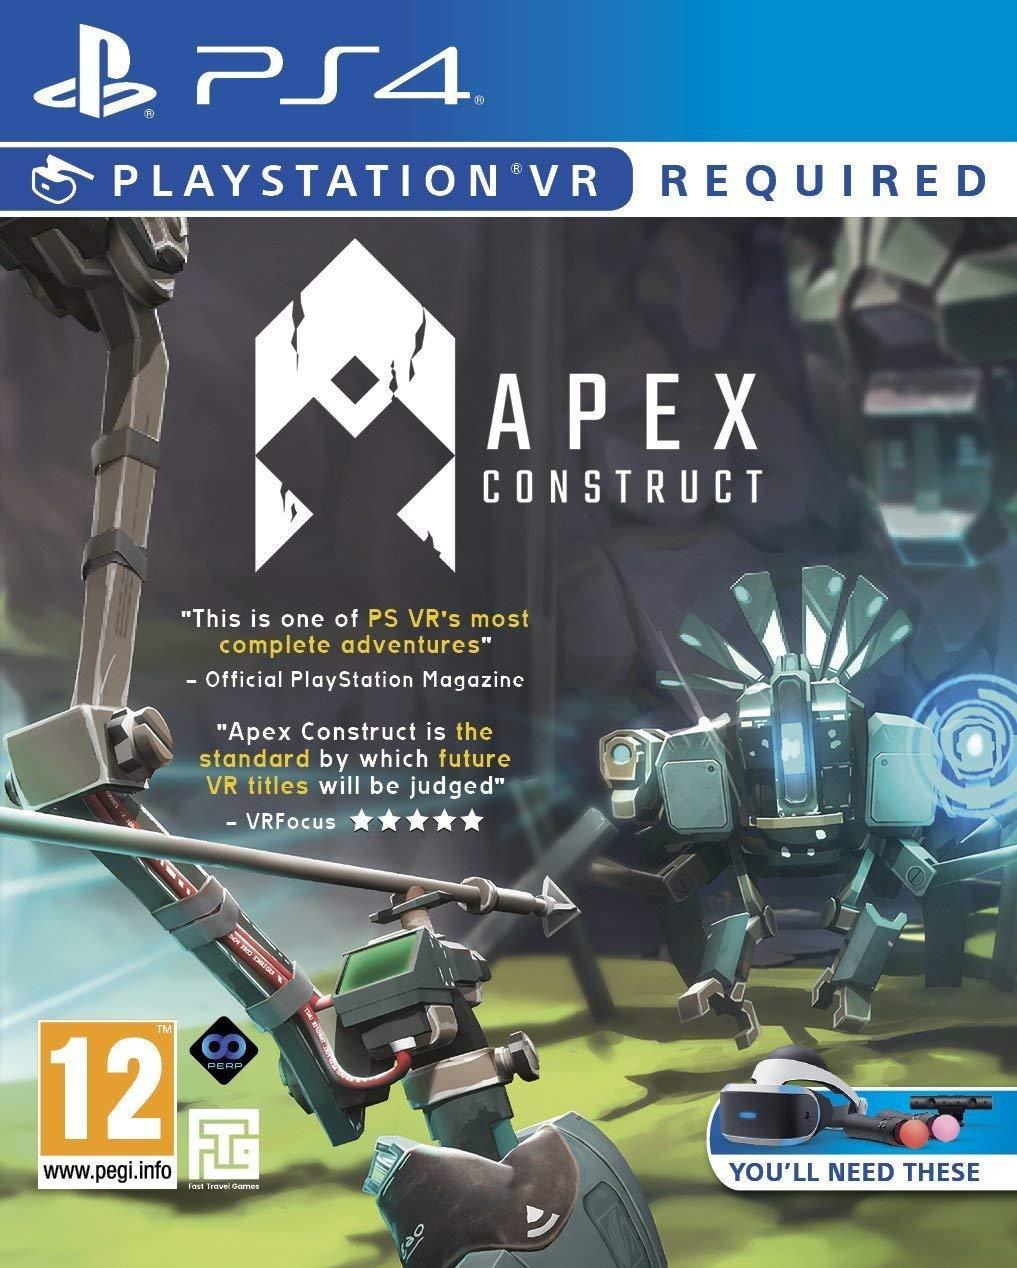 Apex Construct - PlayStation 4 Ps4 VR játékok